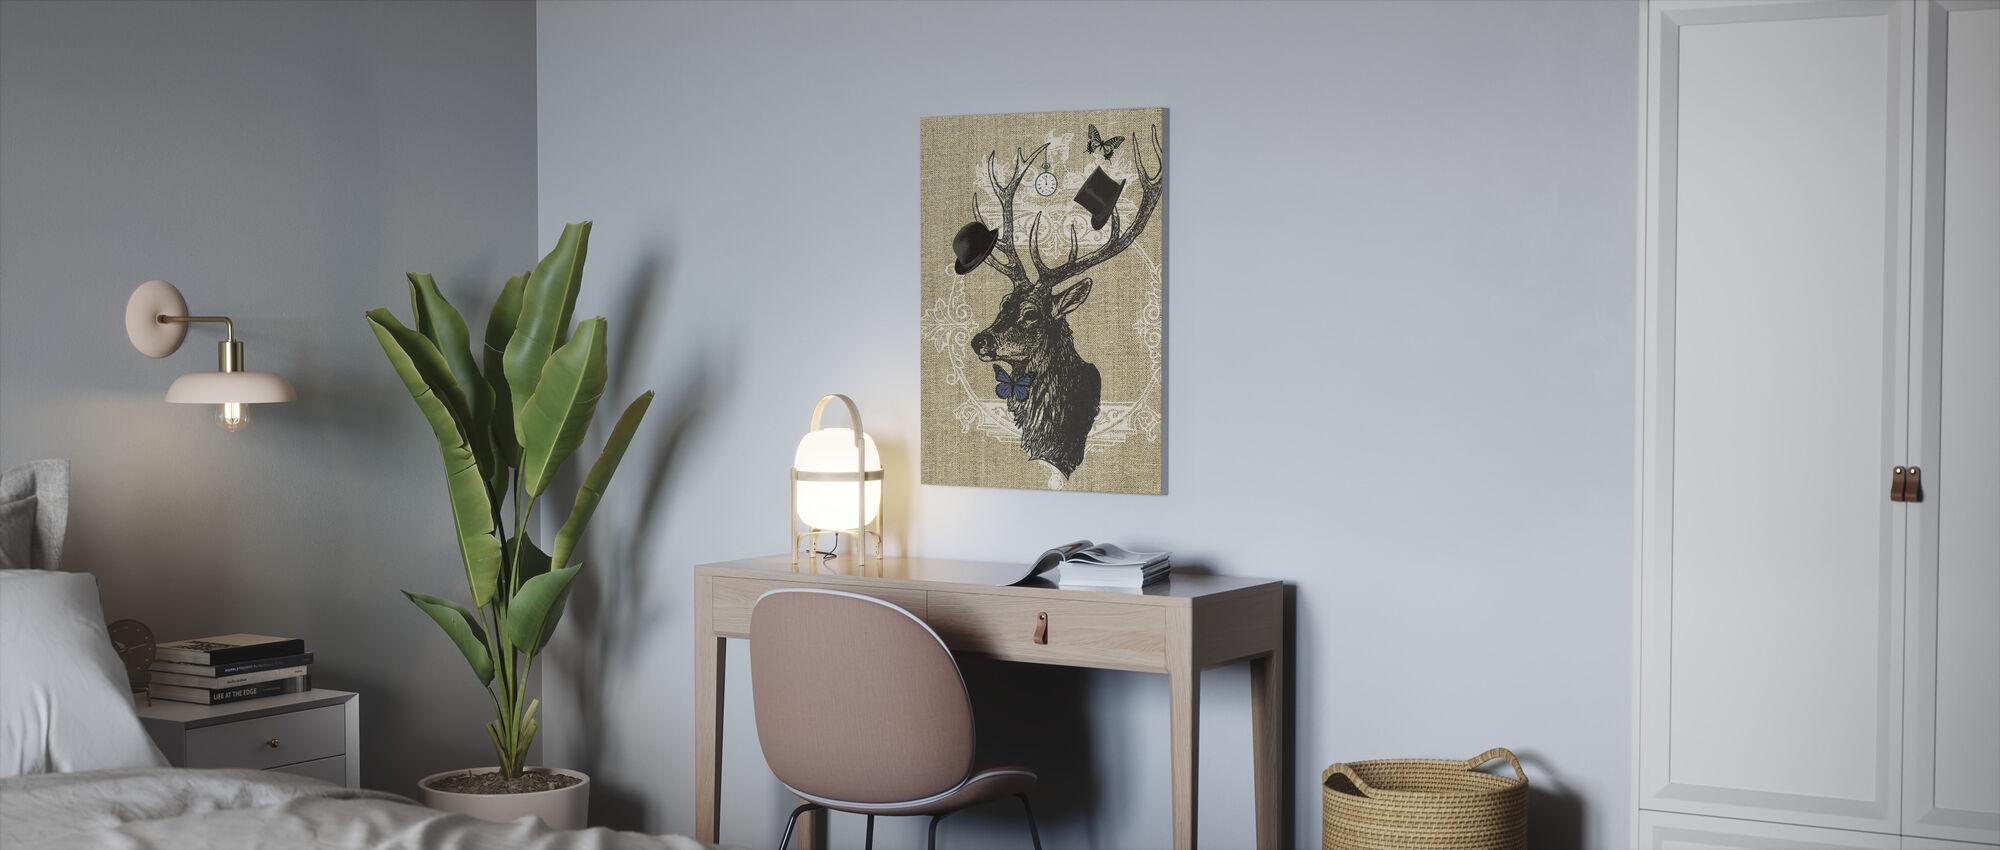 Gentleman hjort Butterfly Lin - Lerretsbilde - Kontor